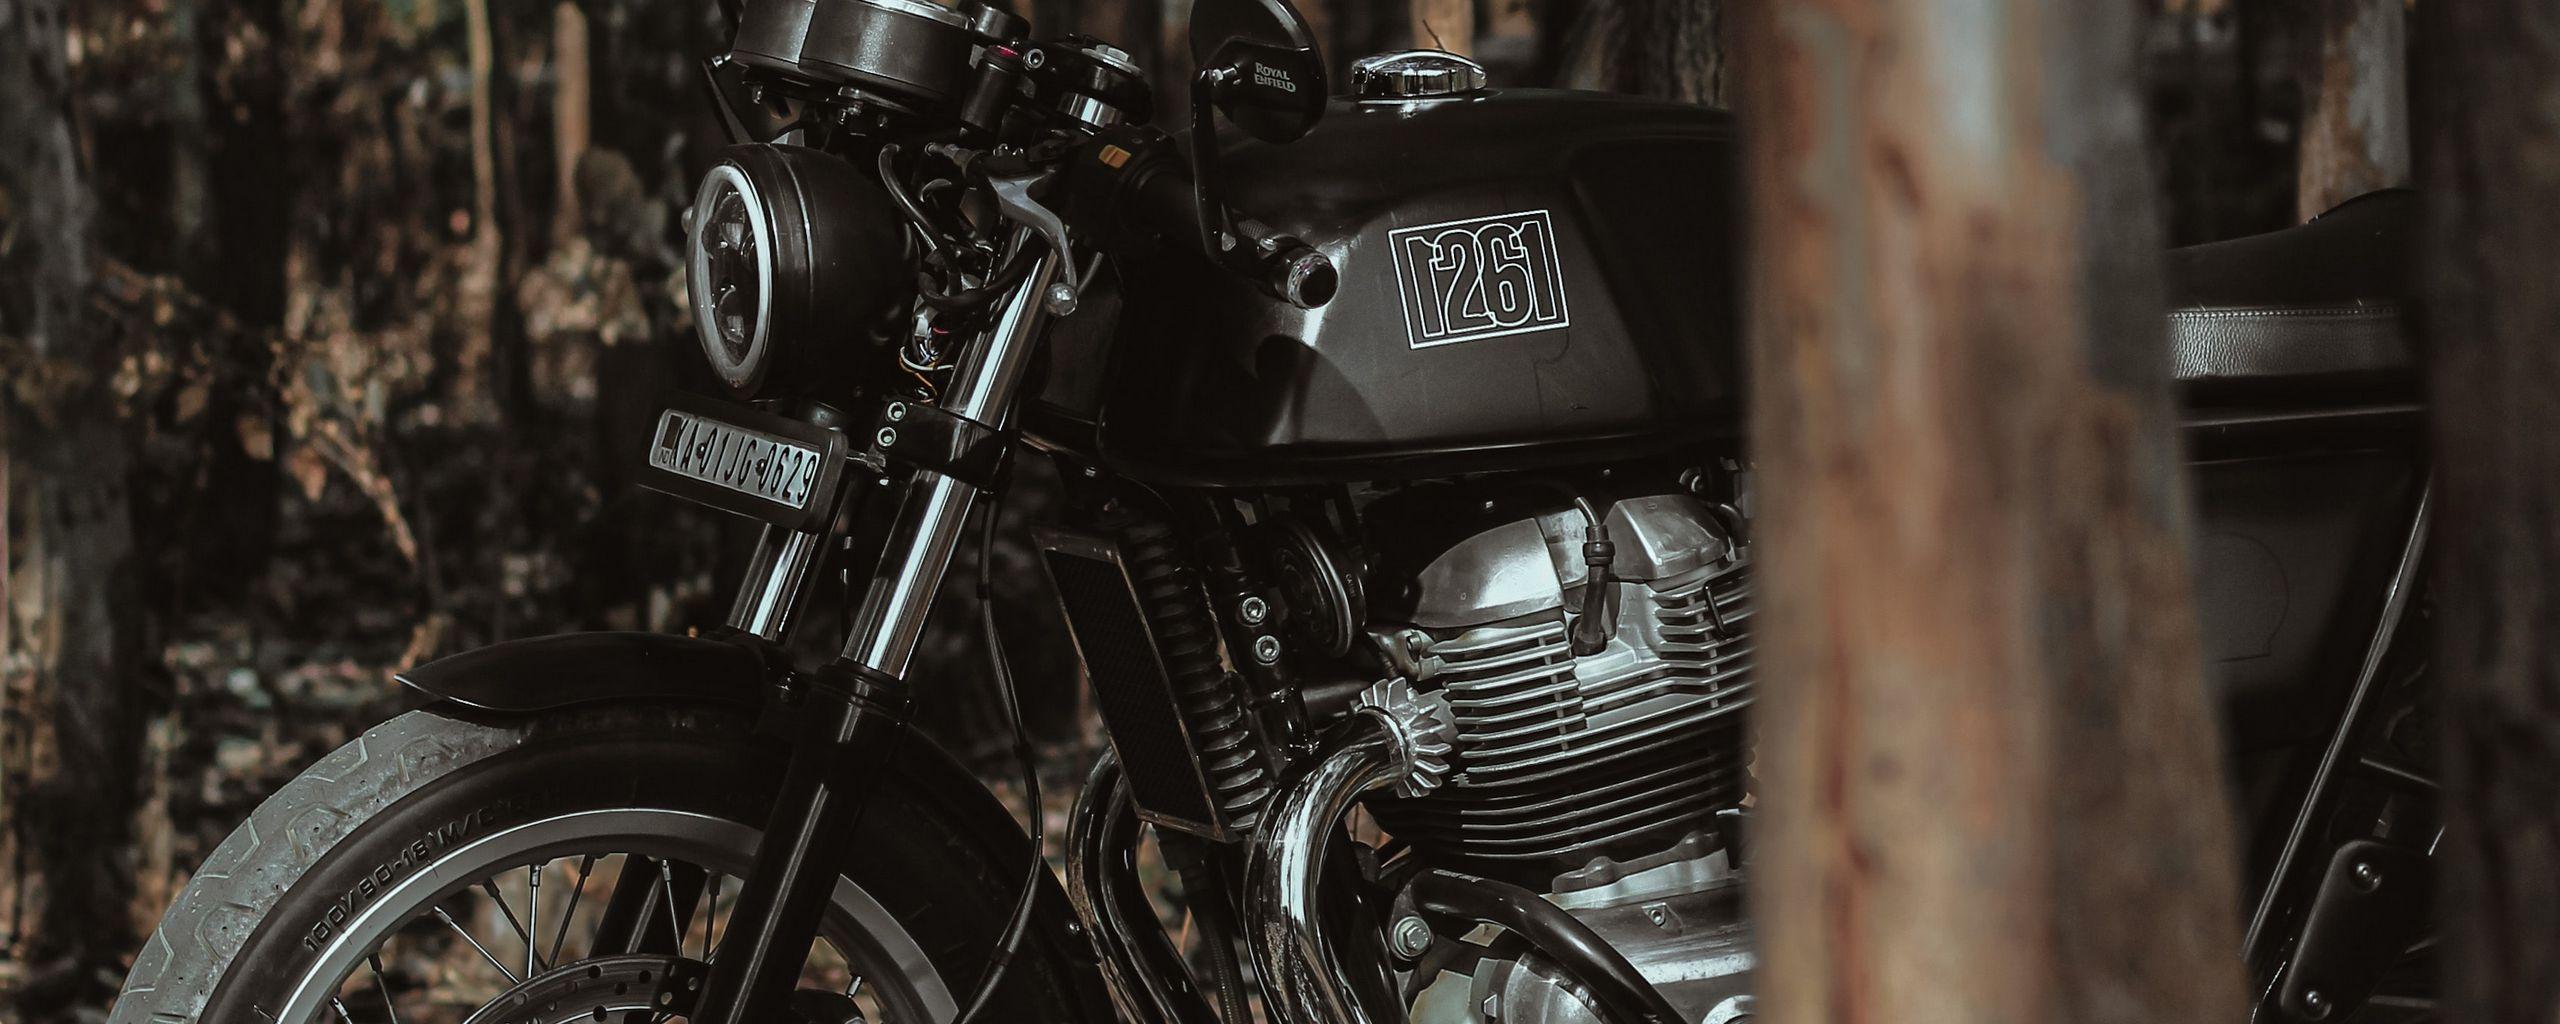 2560x1024 Wallpaper royal enfield, motorcycle, bike, black, forest